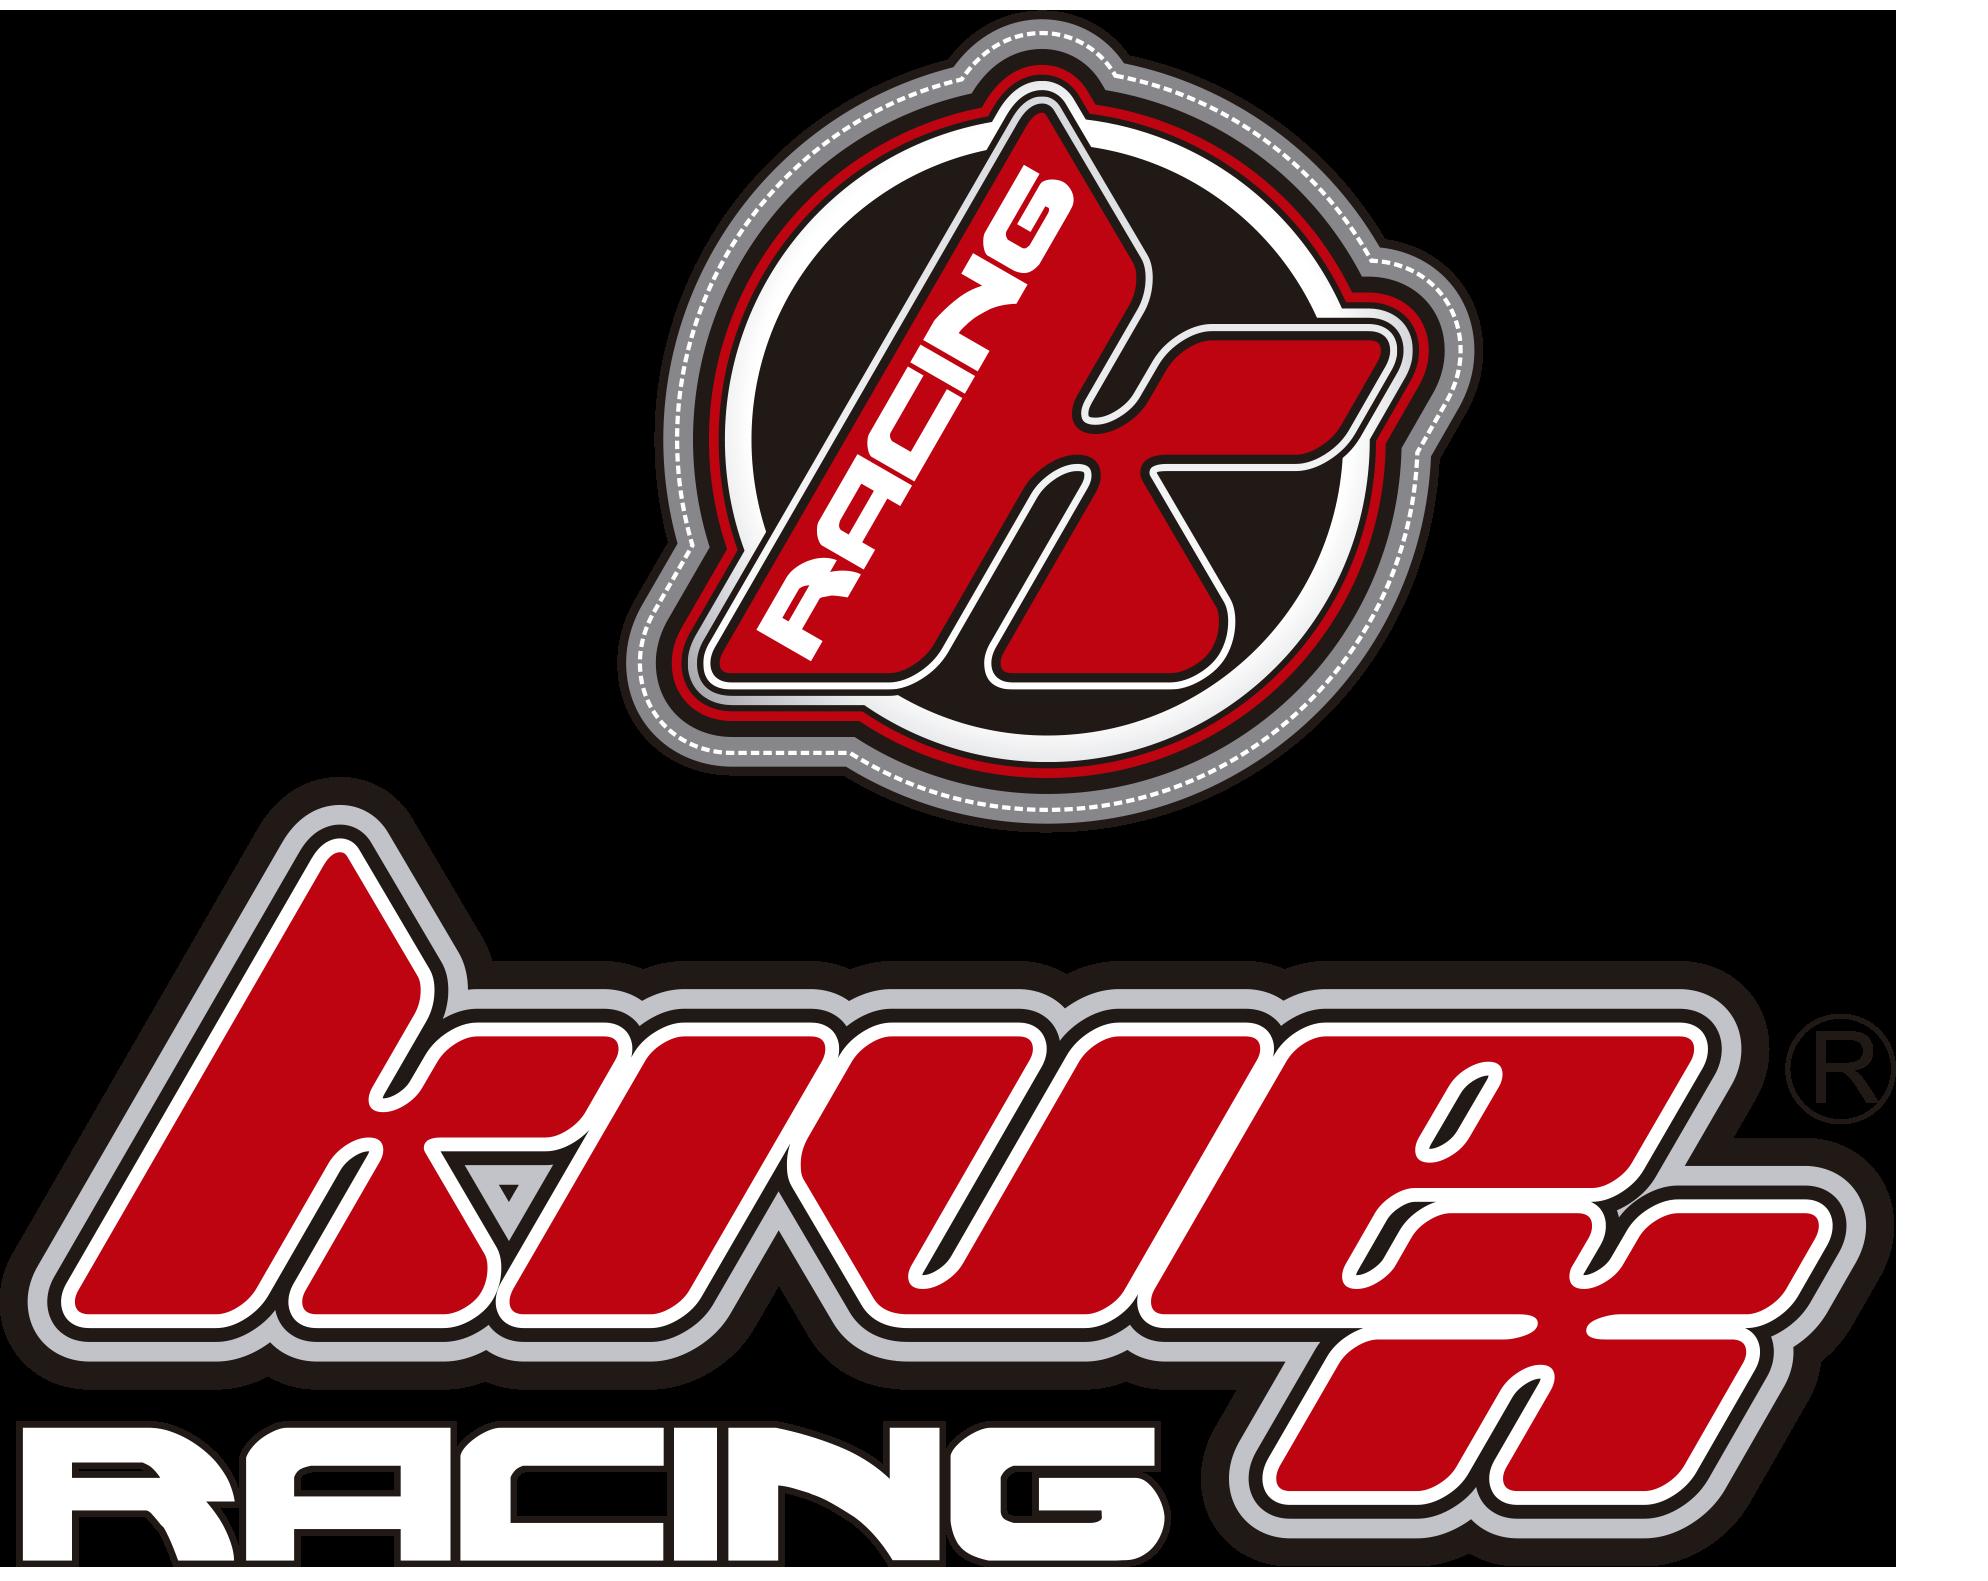 Kivex Racing